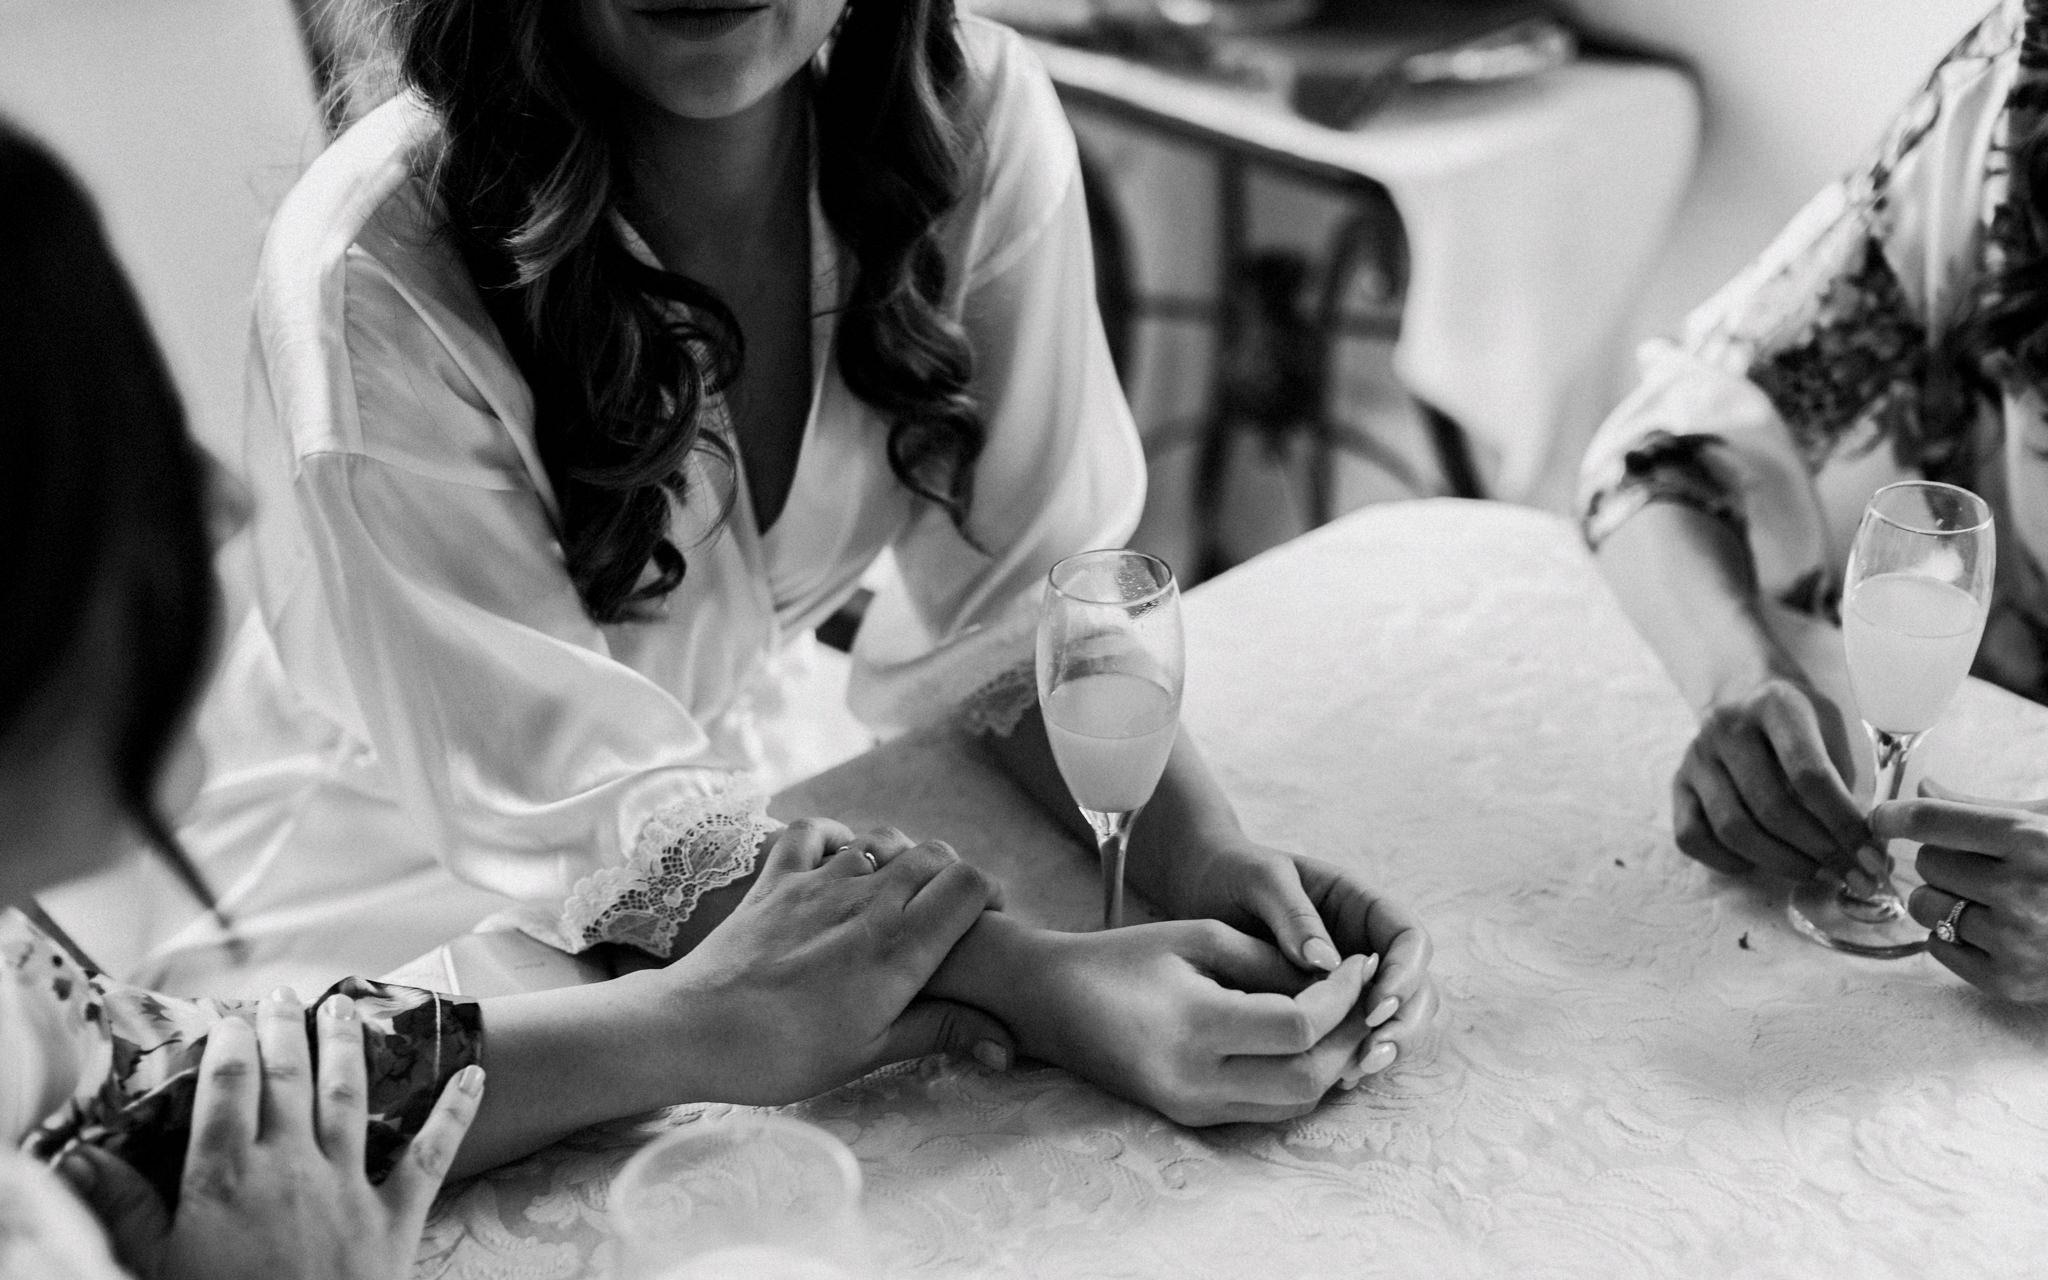 bridesmaid holds brides hand